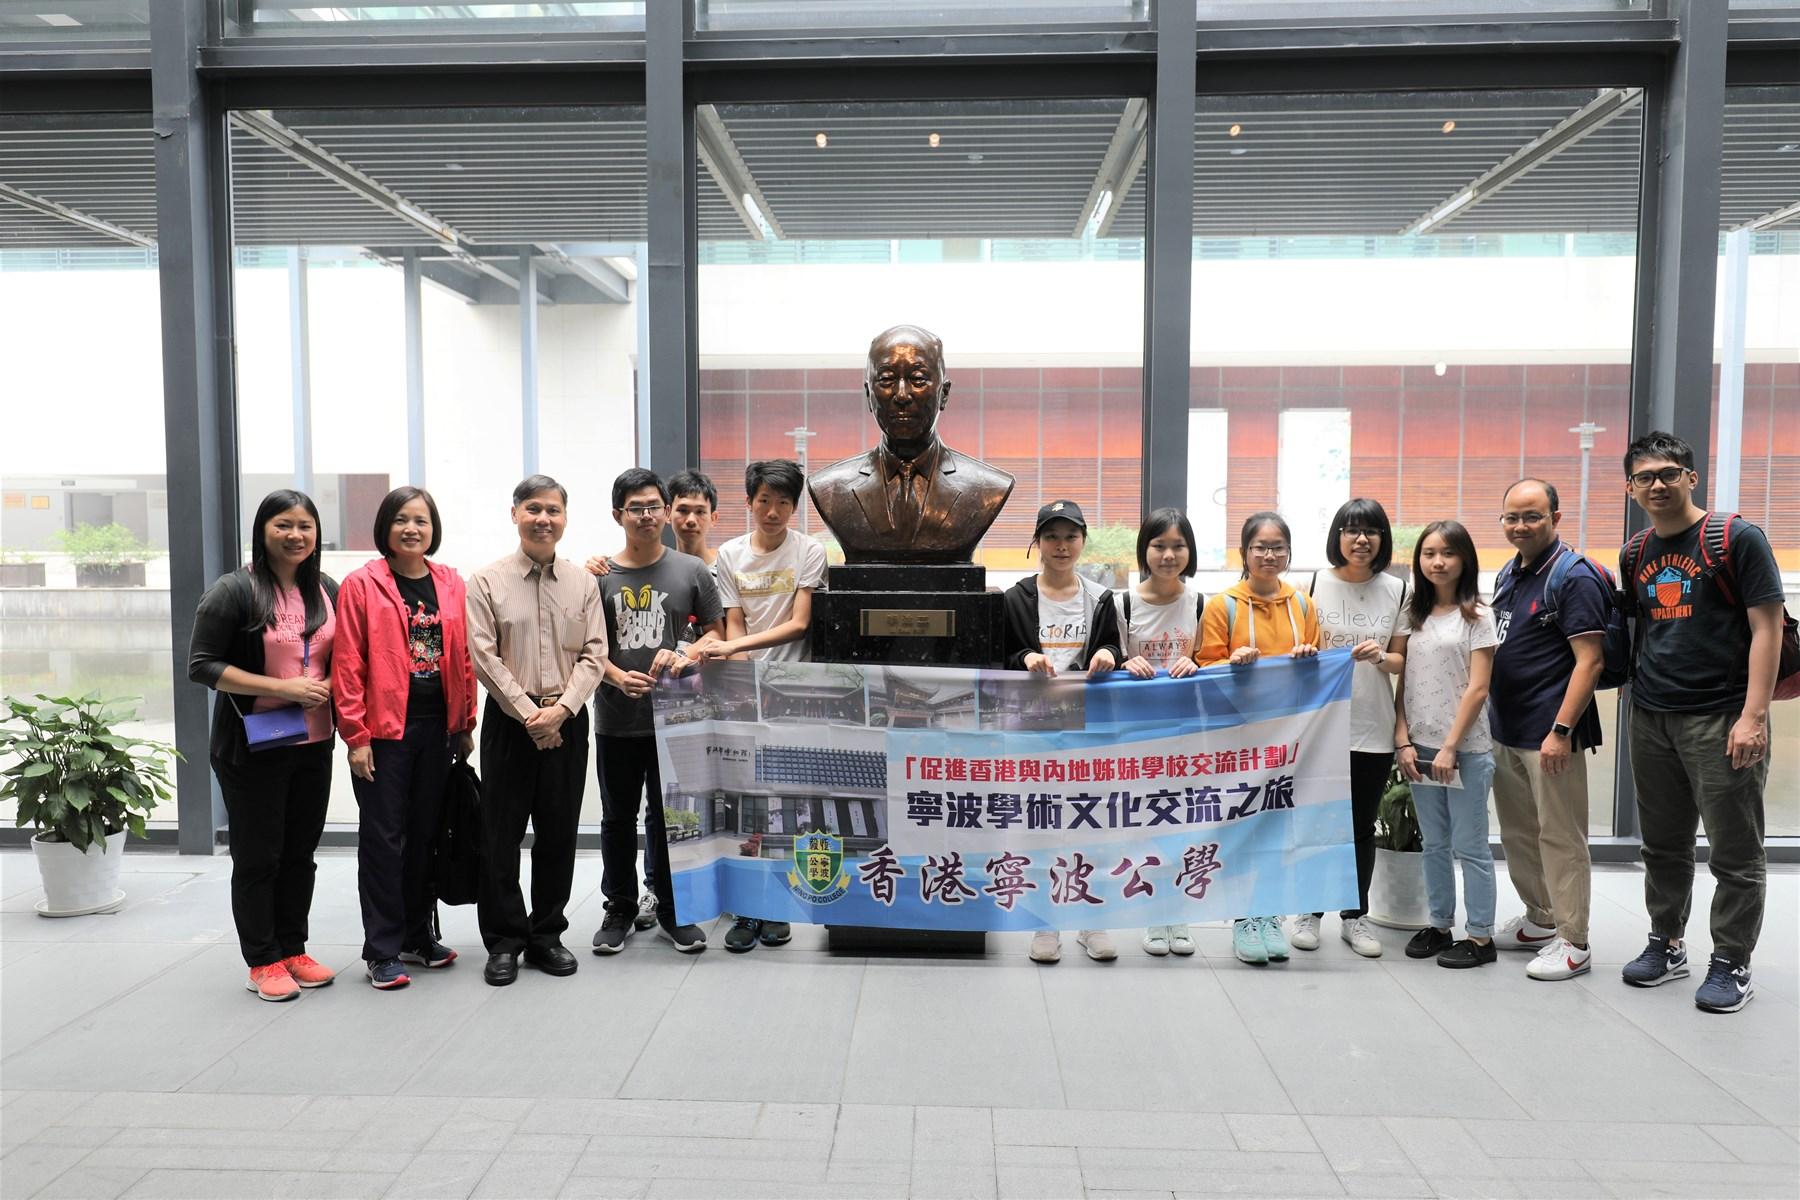 http://npc.edu.hk/sites/default/files/kcng3096.jpg